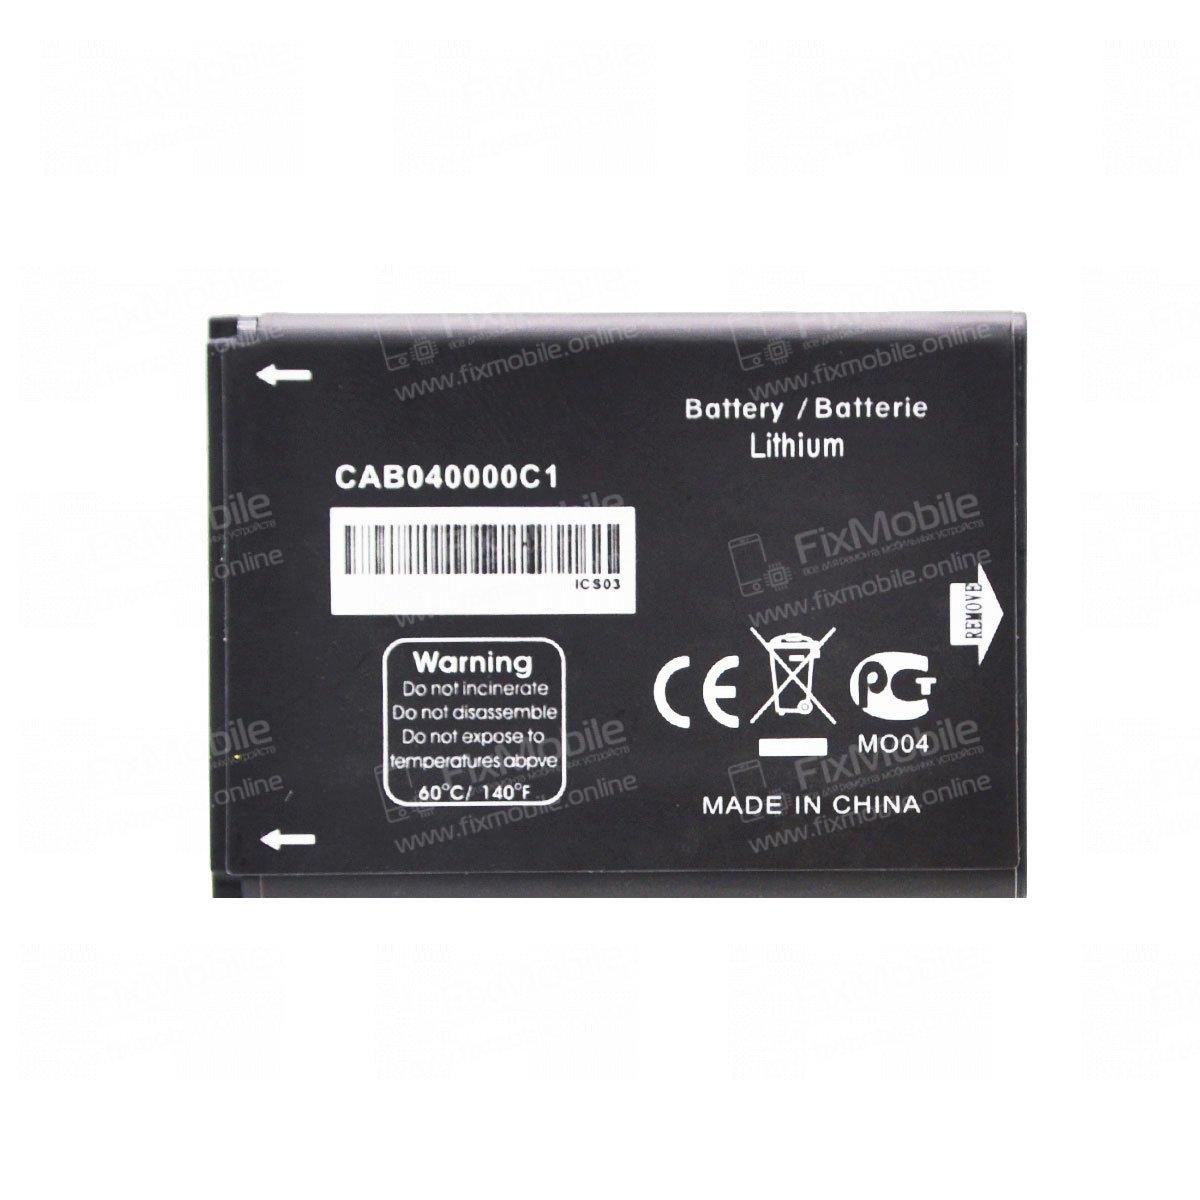 Аккумуляторная батарея для Alcatel One Touch 1052D CAB0400000C1